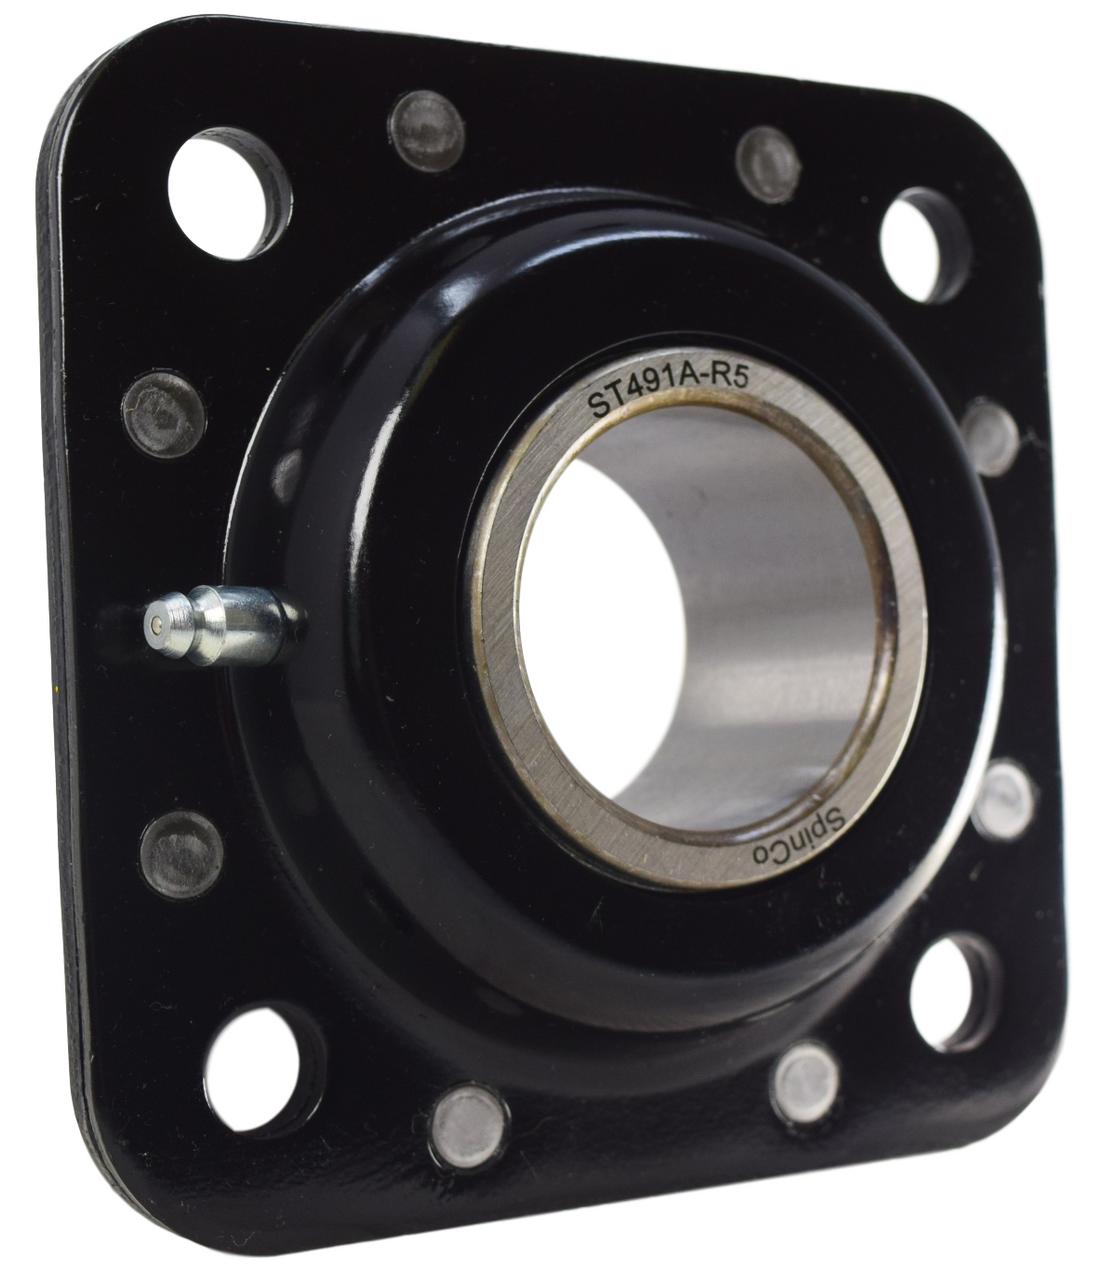 ST491A , FD209RA , DHU1-3/4R-209 Disc Harrow Unit with 5-Lip Seal Upgrade Image